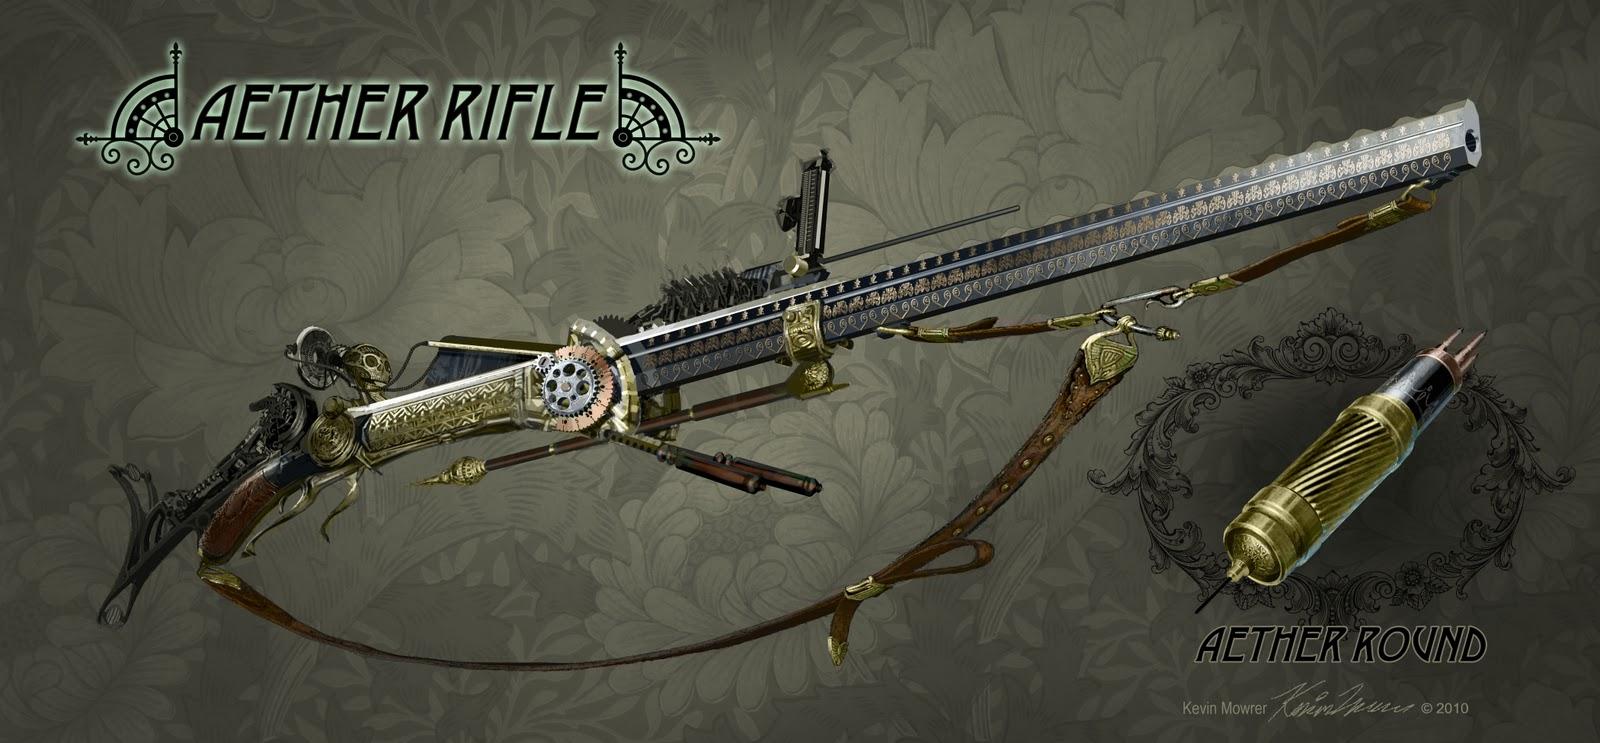 "Alexander ""Seryivolk"" Karlov, Mercenario de los Tuneles Steampunk+Aether+rifle+V5"